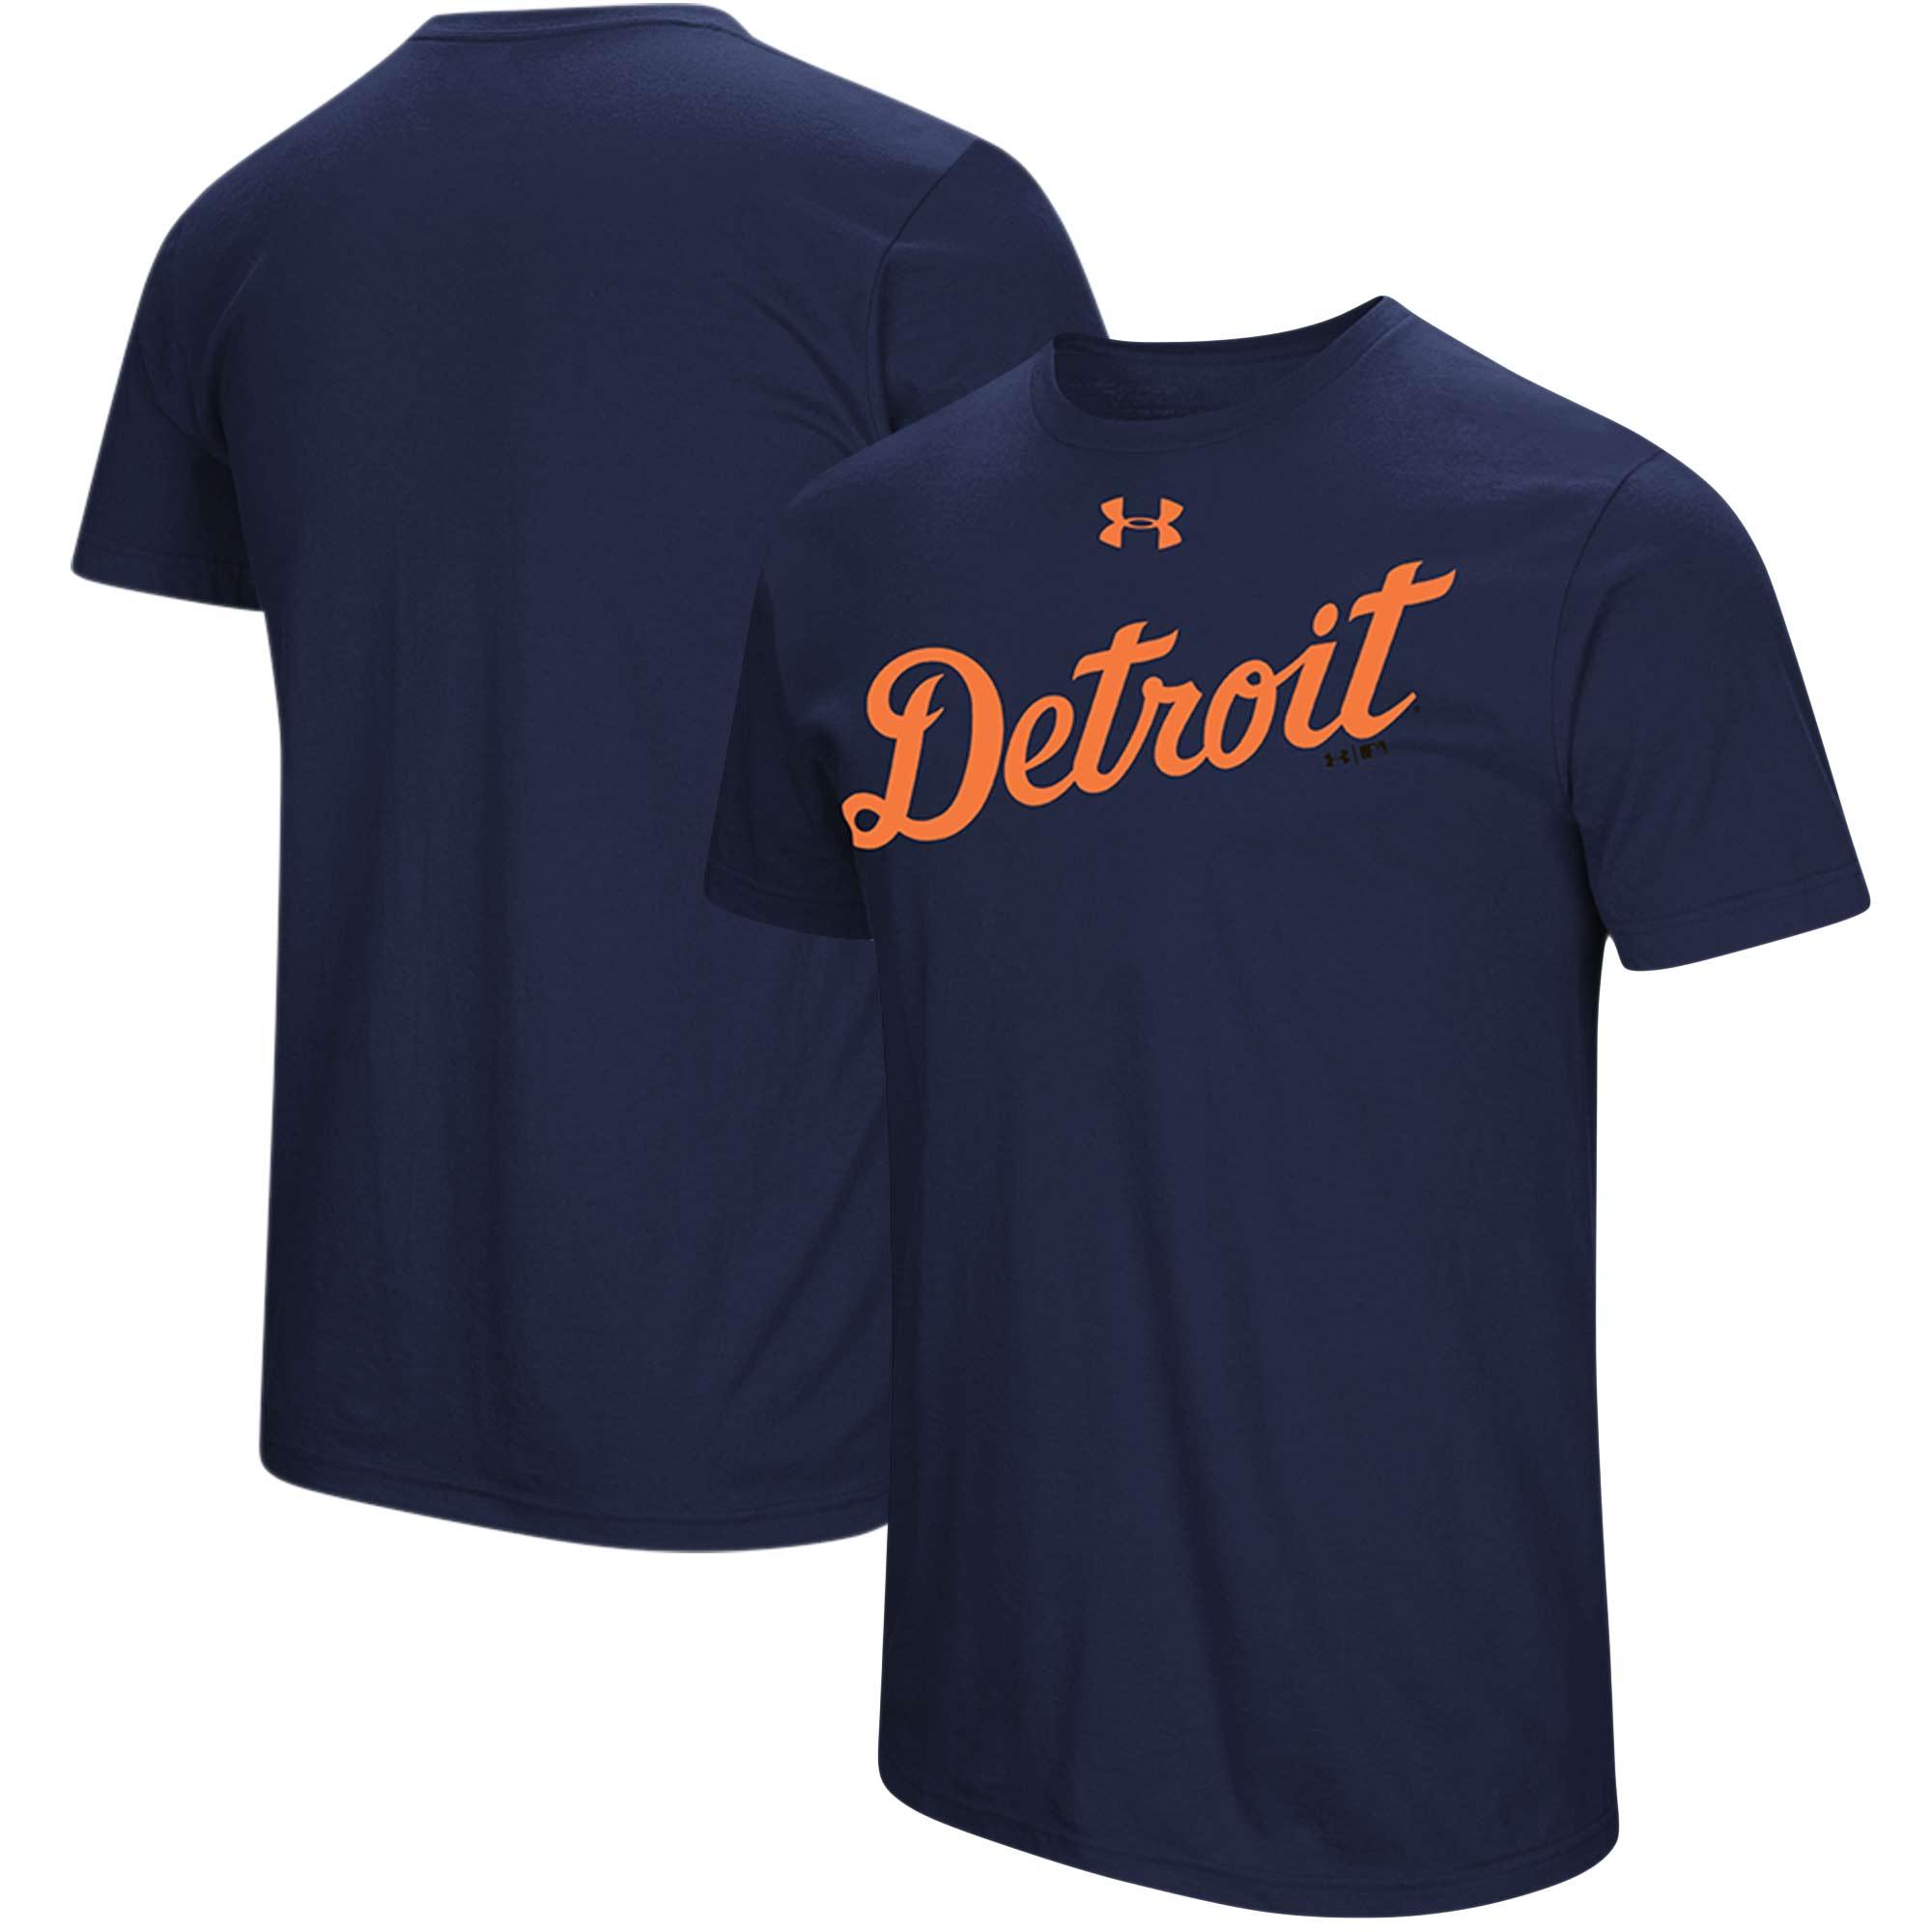 Detroit Tigers Under Armour Passion Road Team Font T-Shirt - Navy